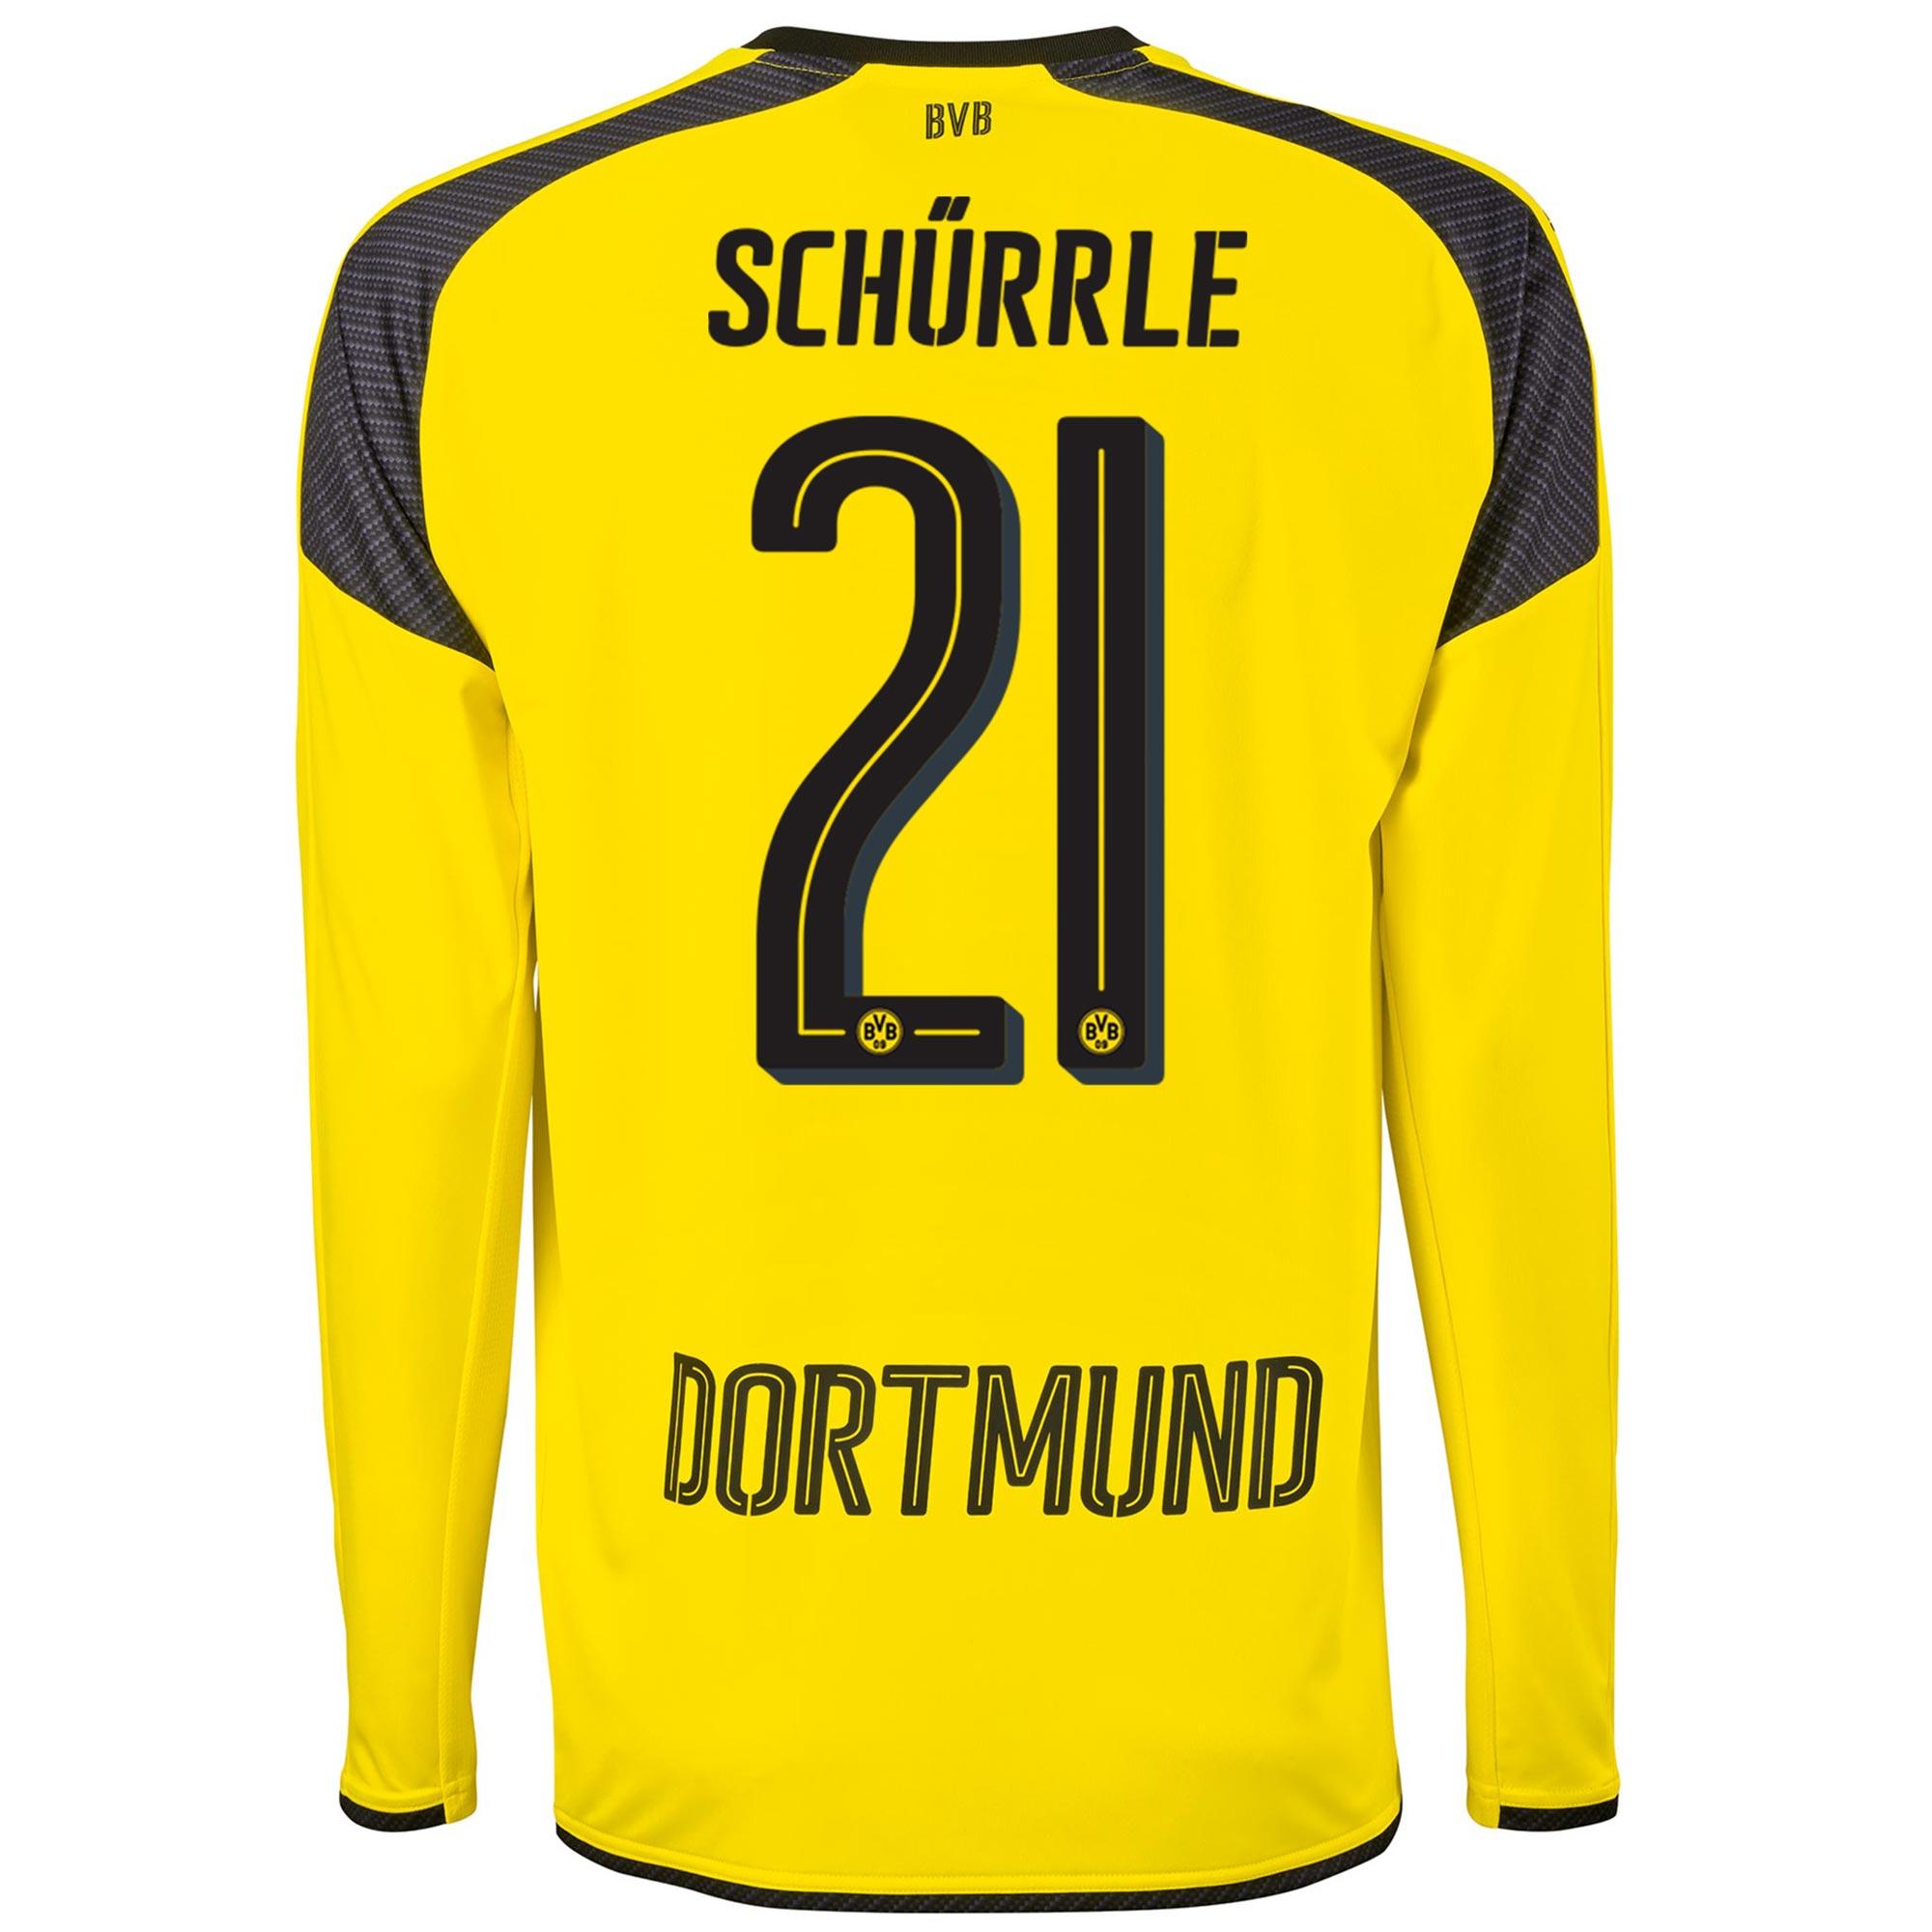 Image of BVB International Home Shirt 2016-17 - Long Sleeve with Schürrle 21 pr, N/A